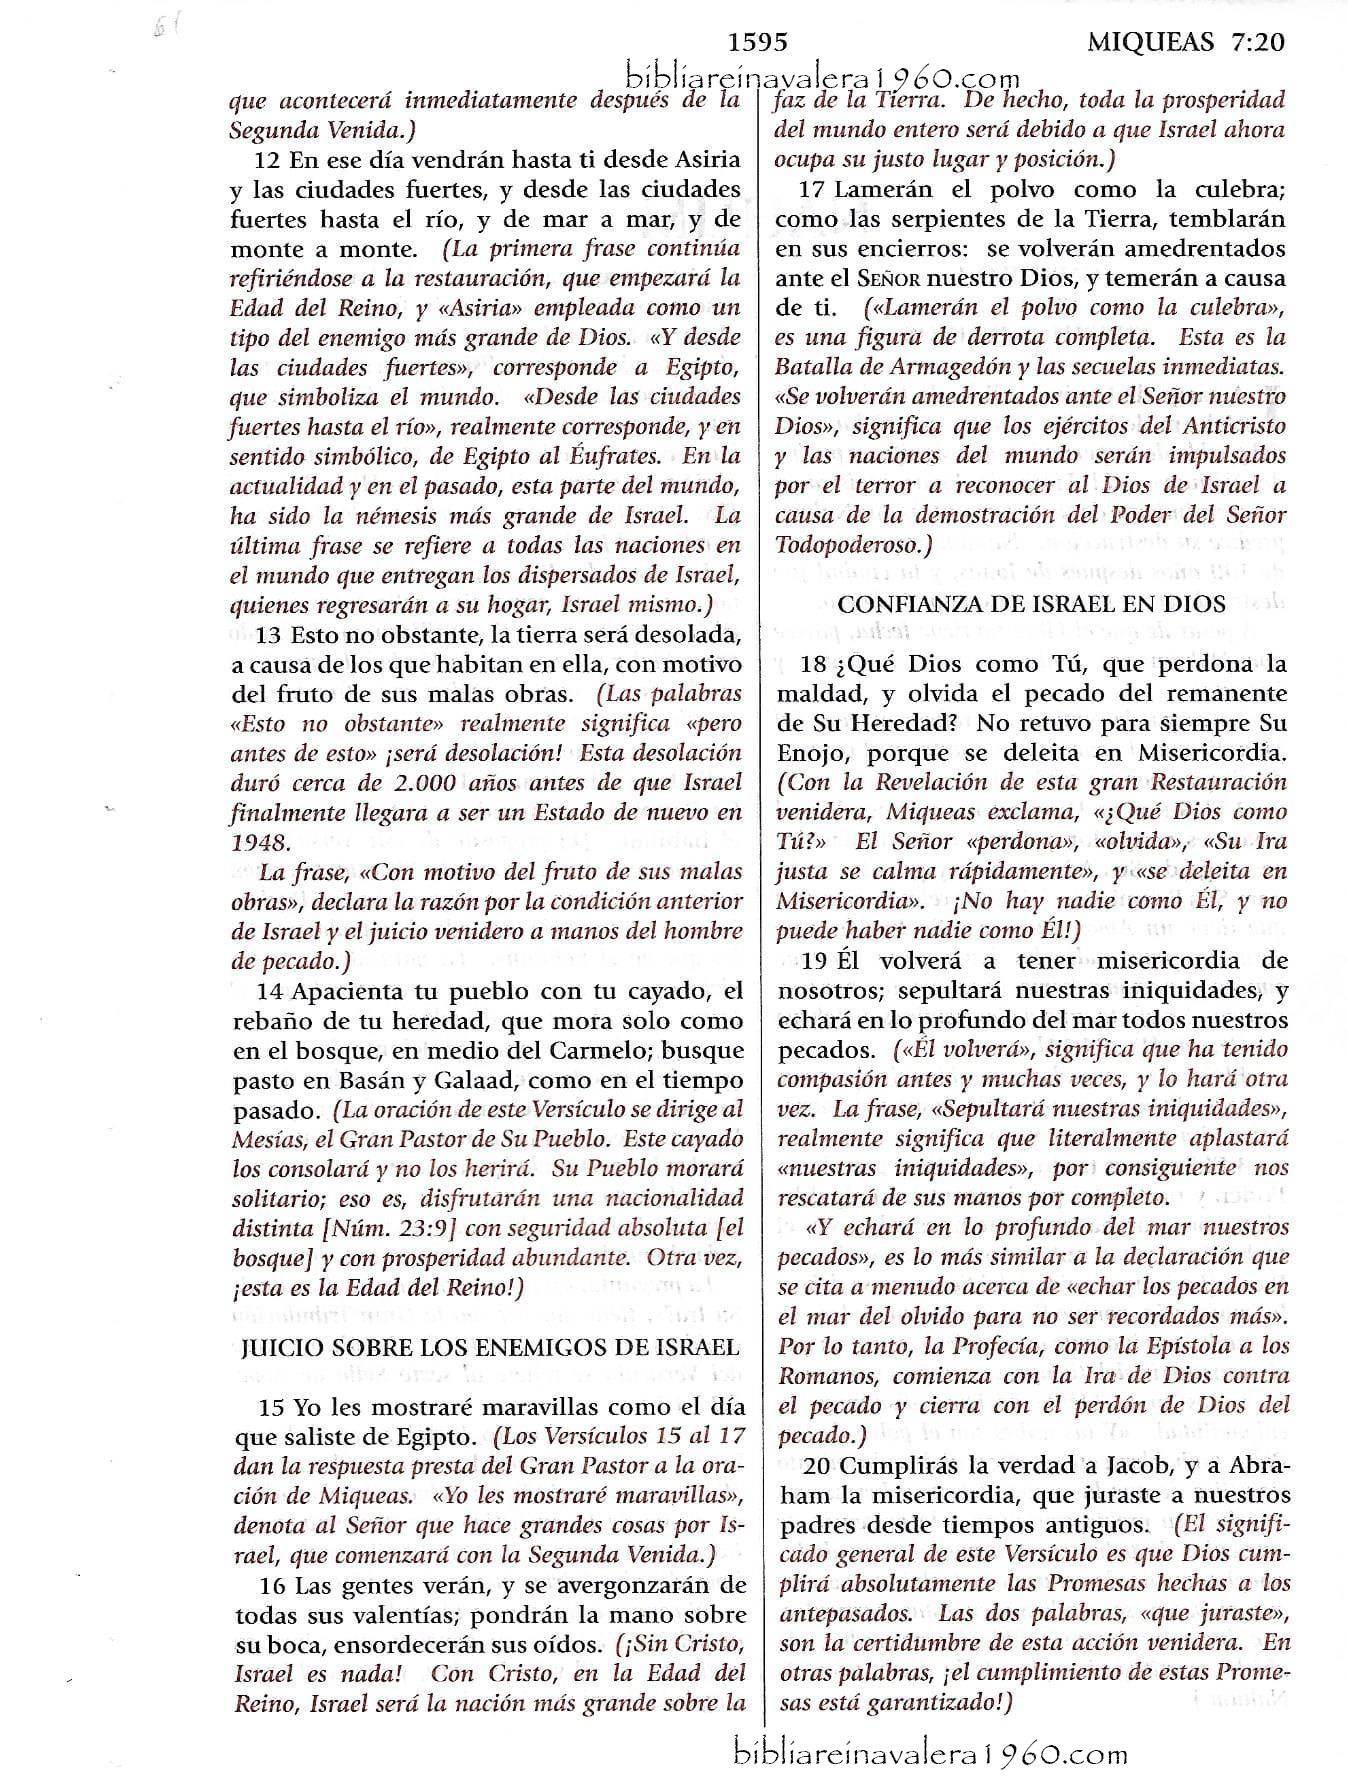 miqueas 7 explicacion 1595